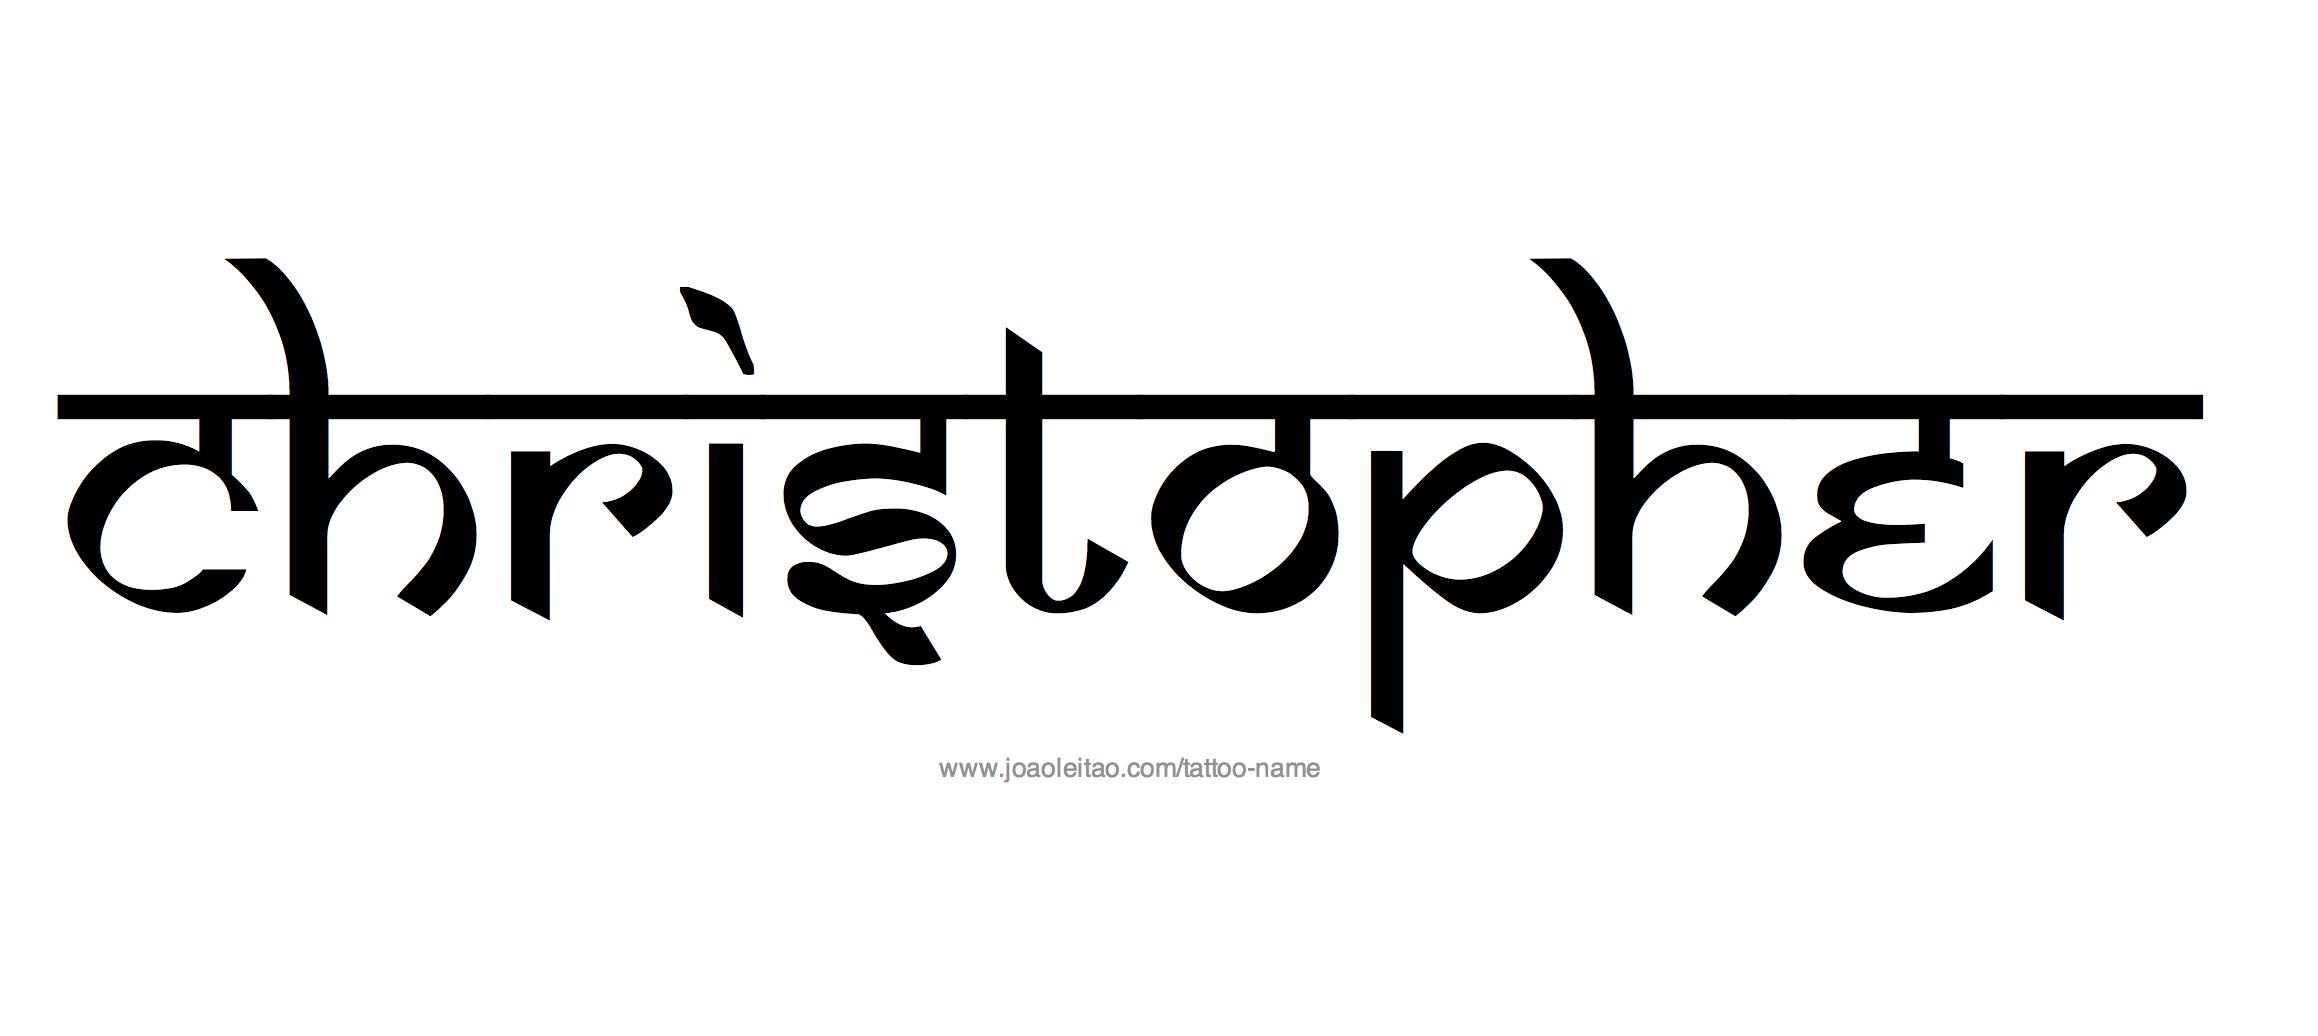 Christopher Name Art | www.pixshark.com - Images Galleries ...